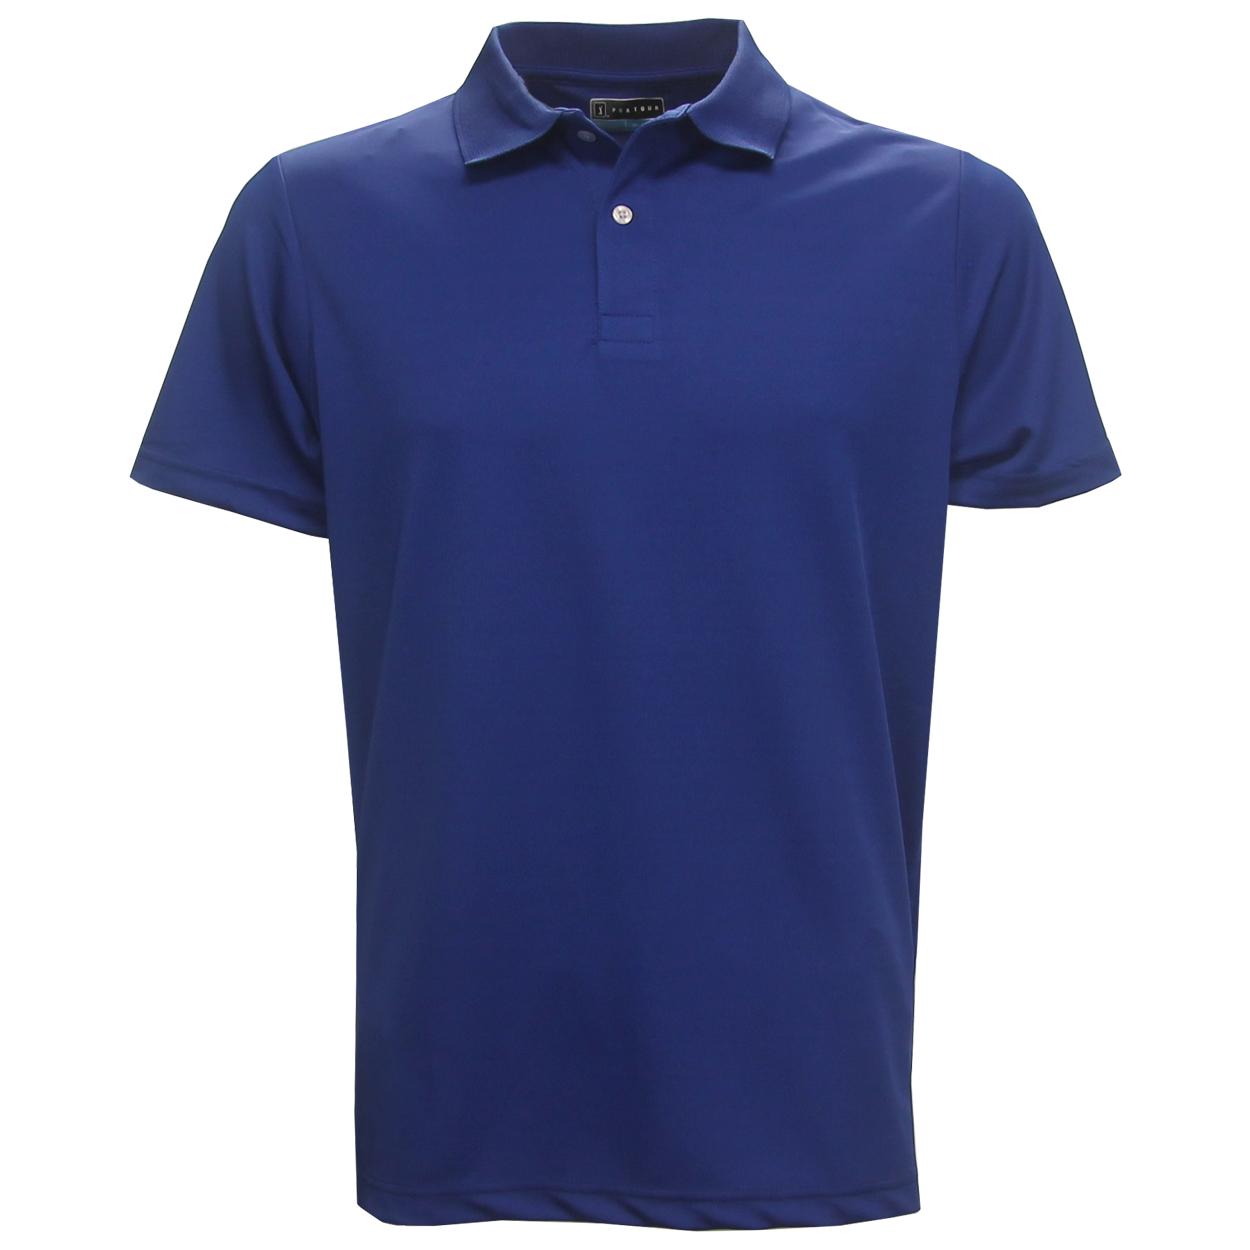 pga tour men u0026 39 s performance solid polo golf shirt  brand